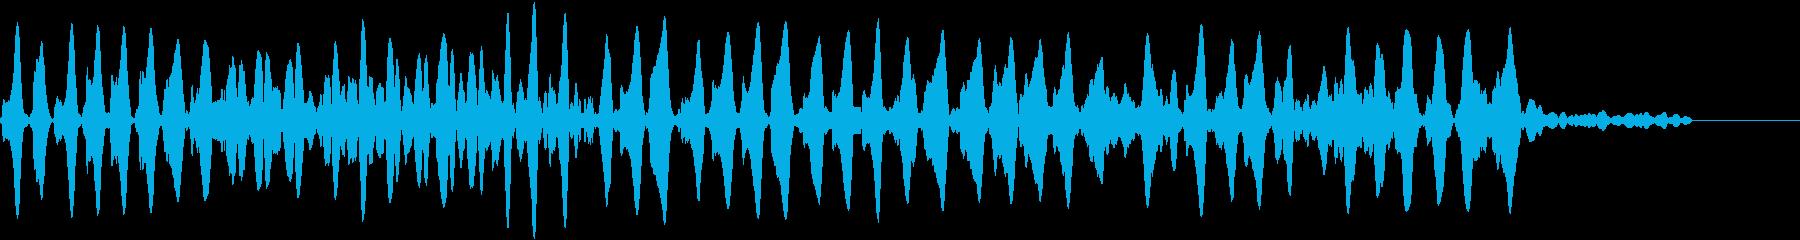 Animal 秋の虫の鳴き声 教育絵本にの再生済みの波形